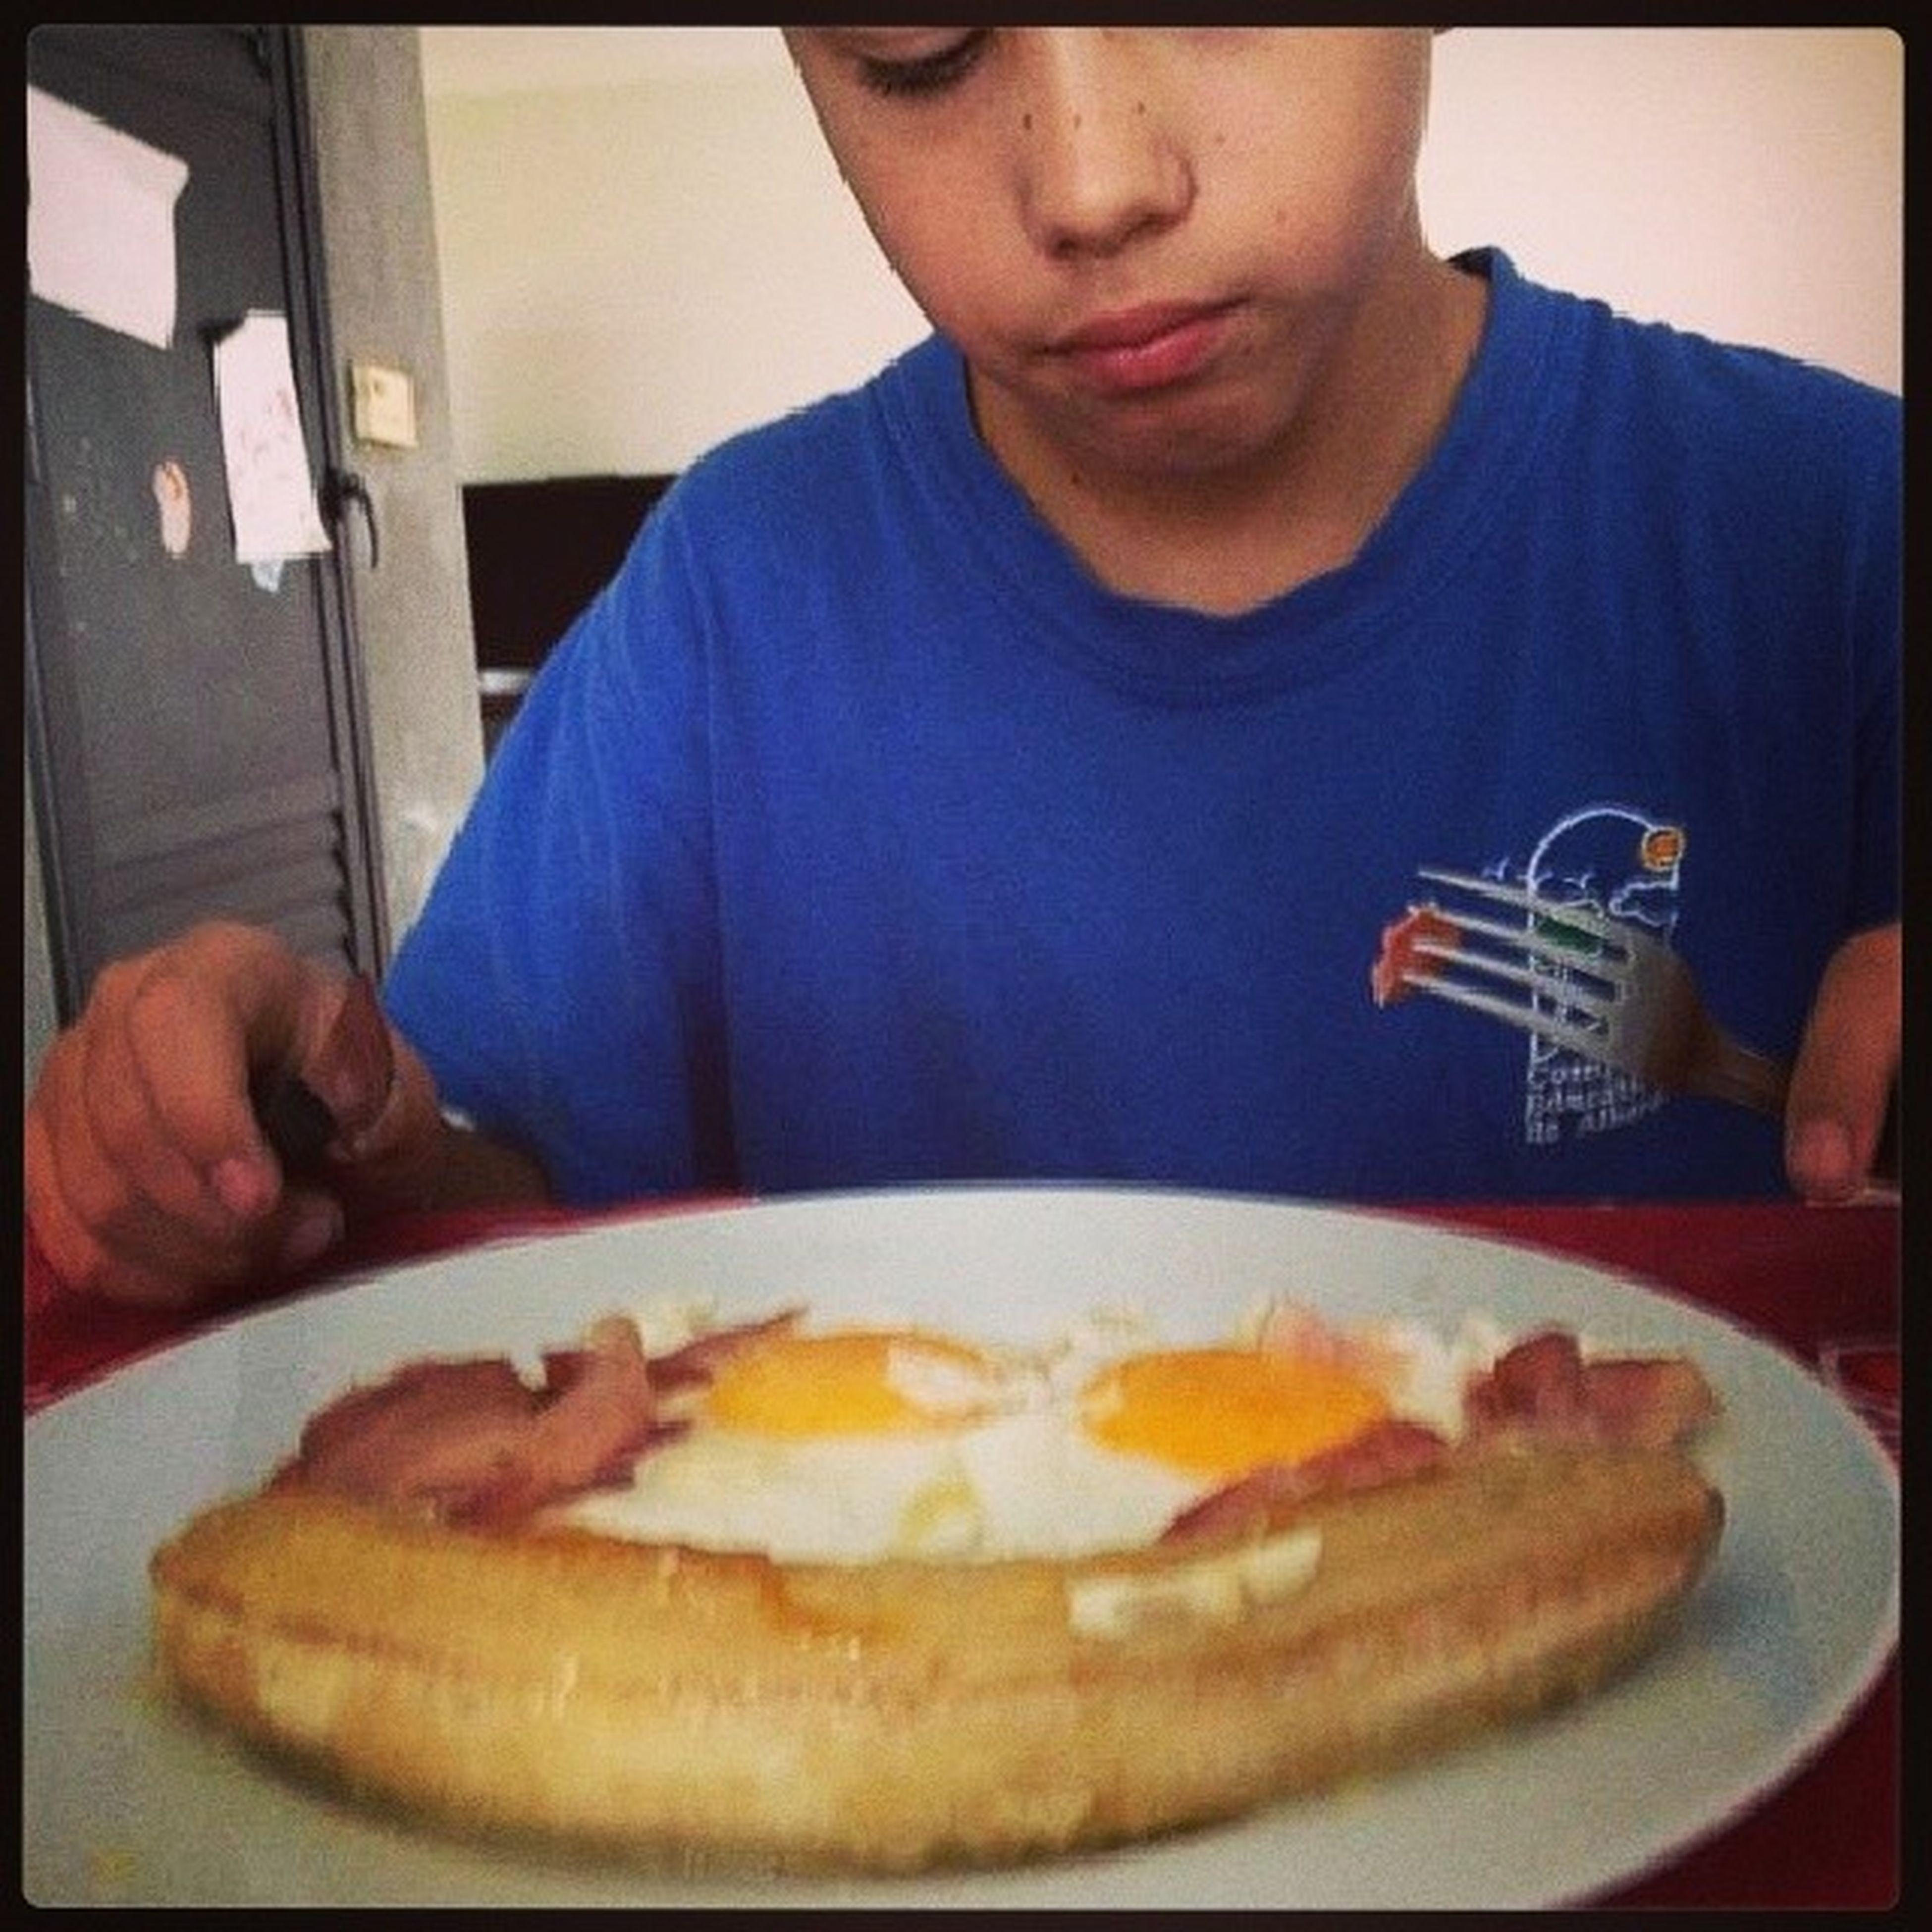 Mi hermano ingiriendo calorías since 2002. Panceta Huevo Banana Frito fat ?